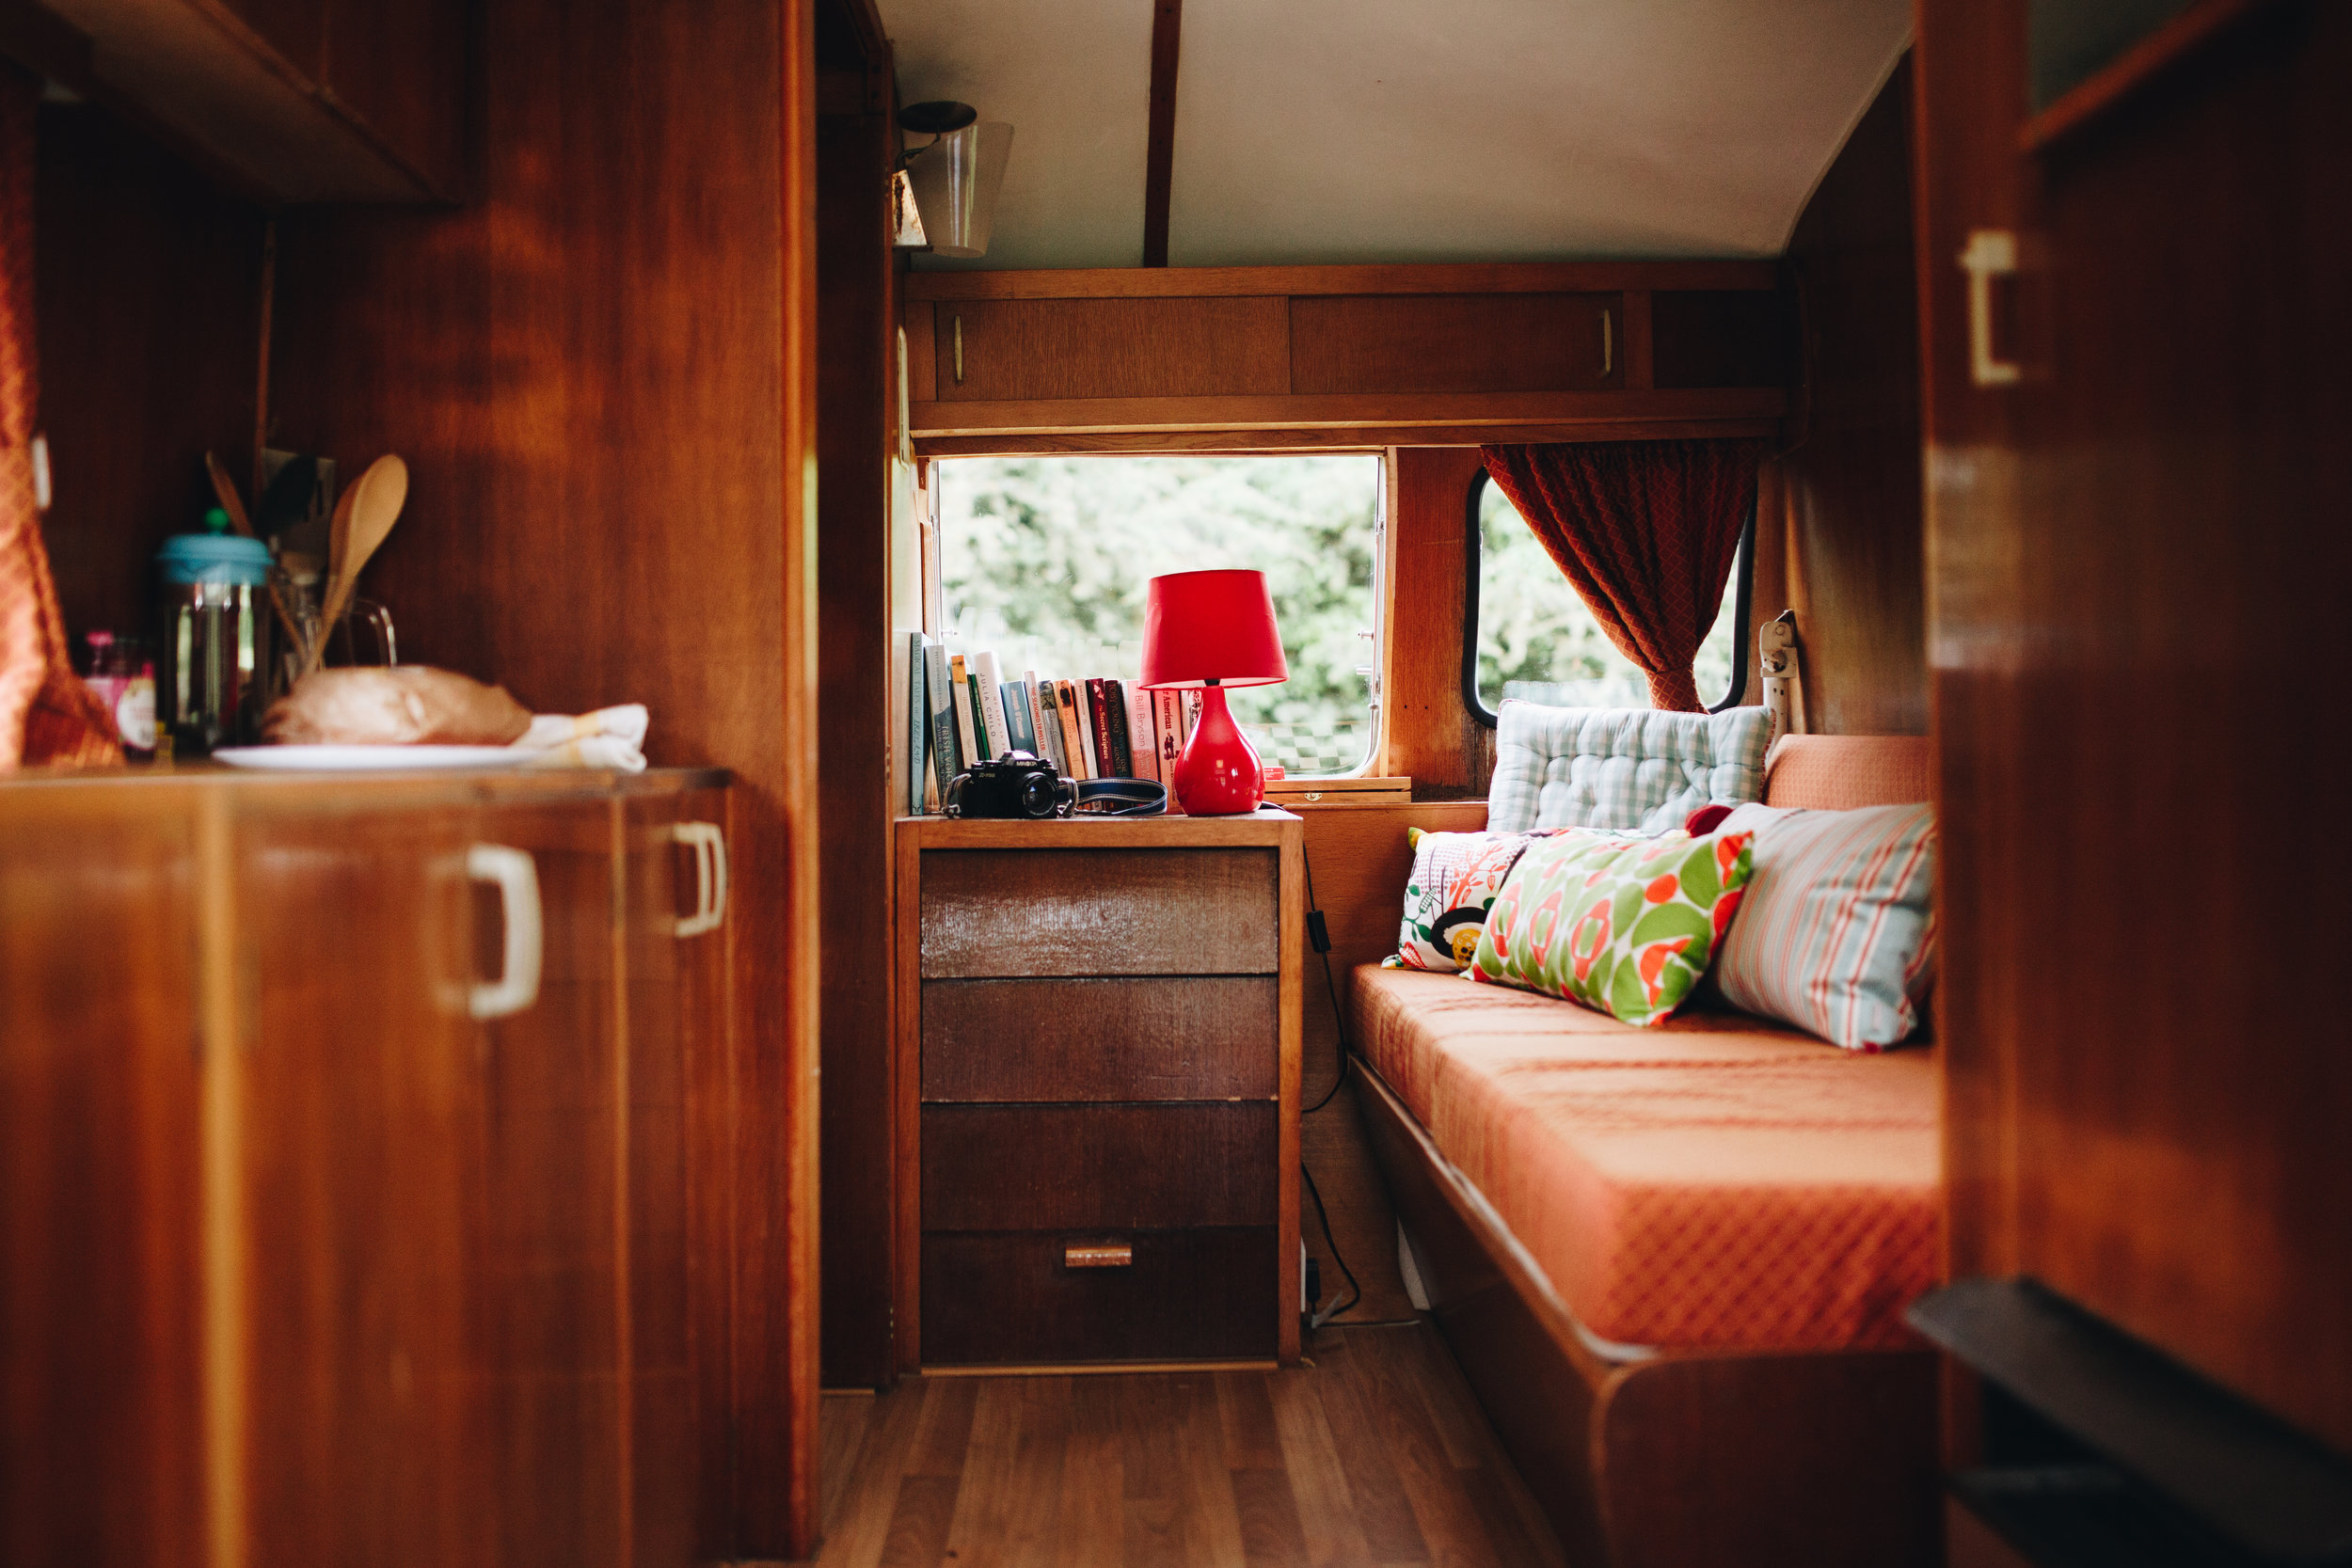 ireland-camper-8636.jpg